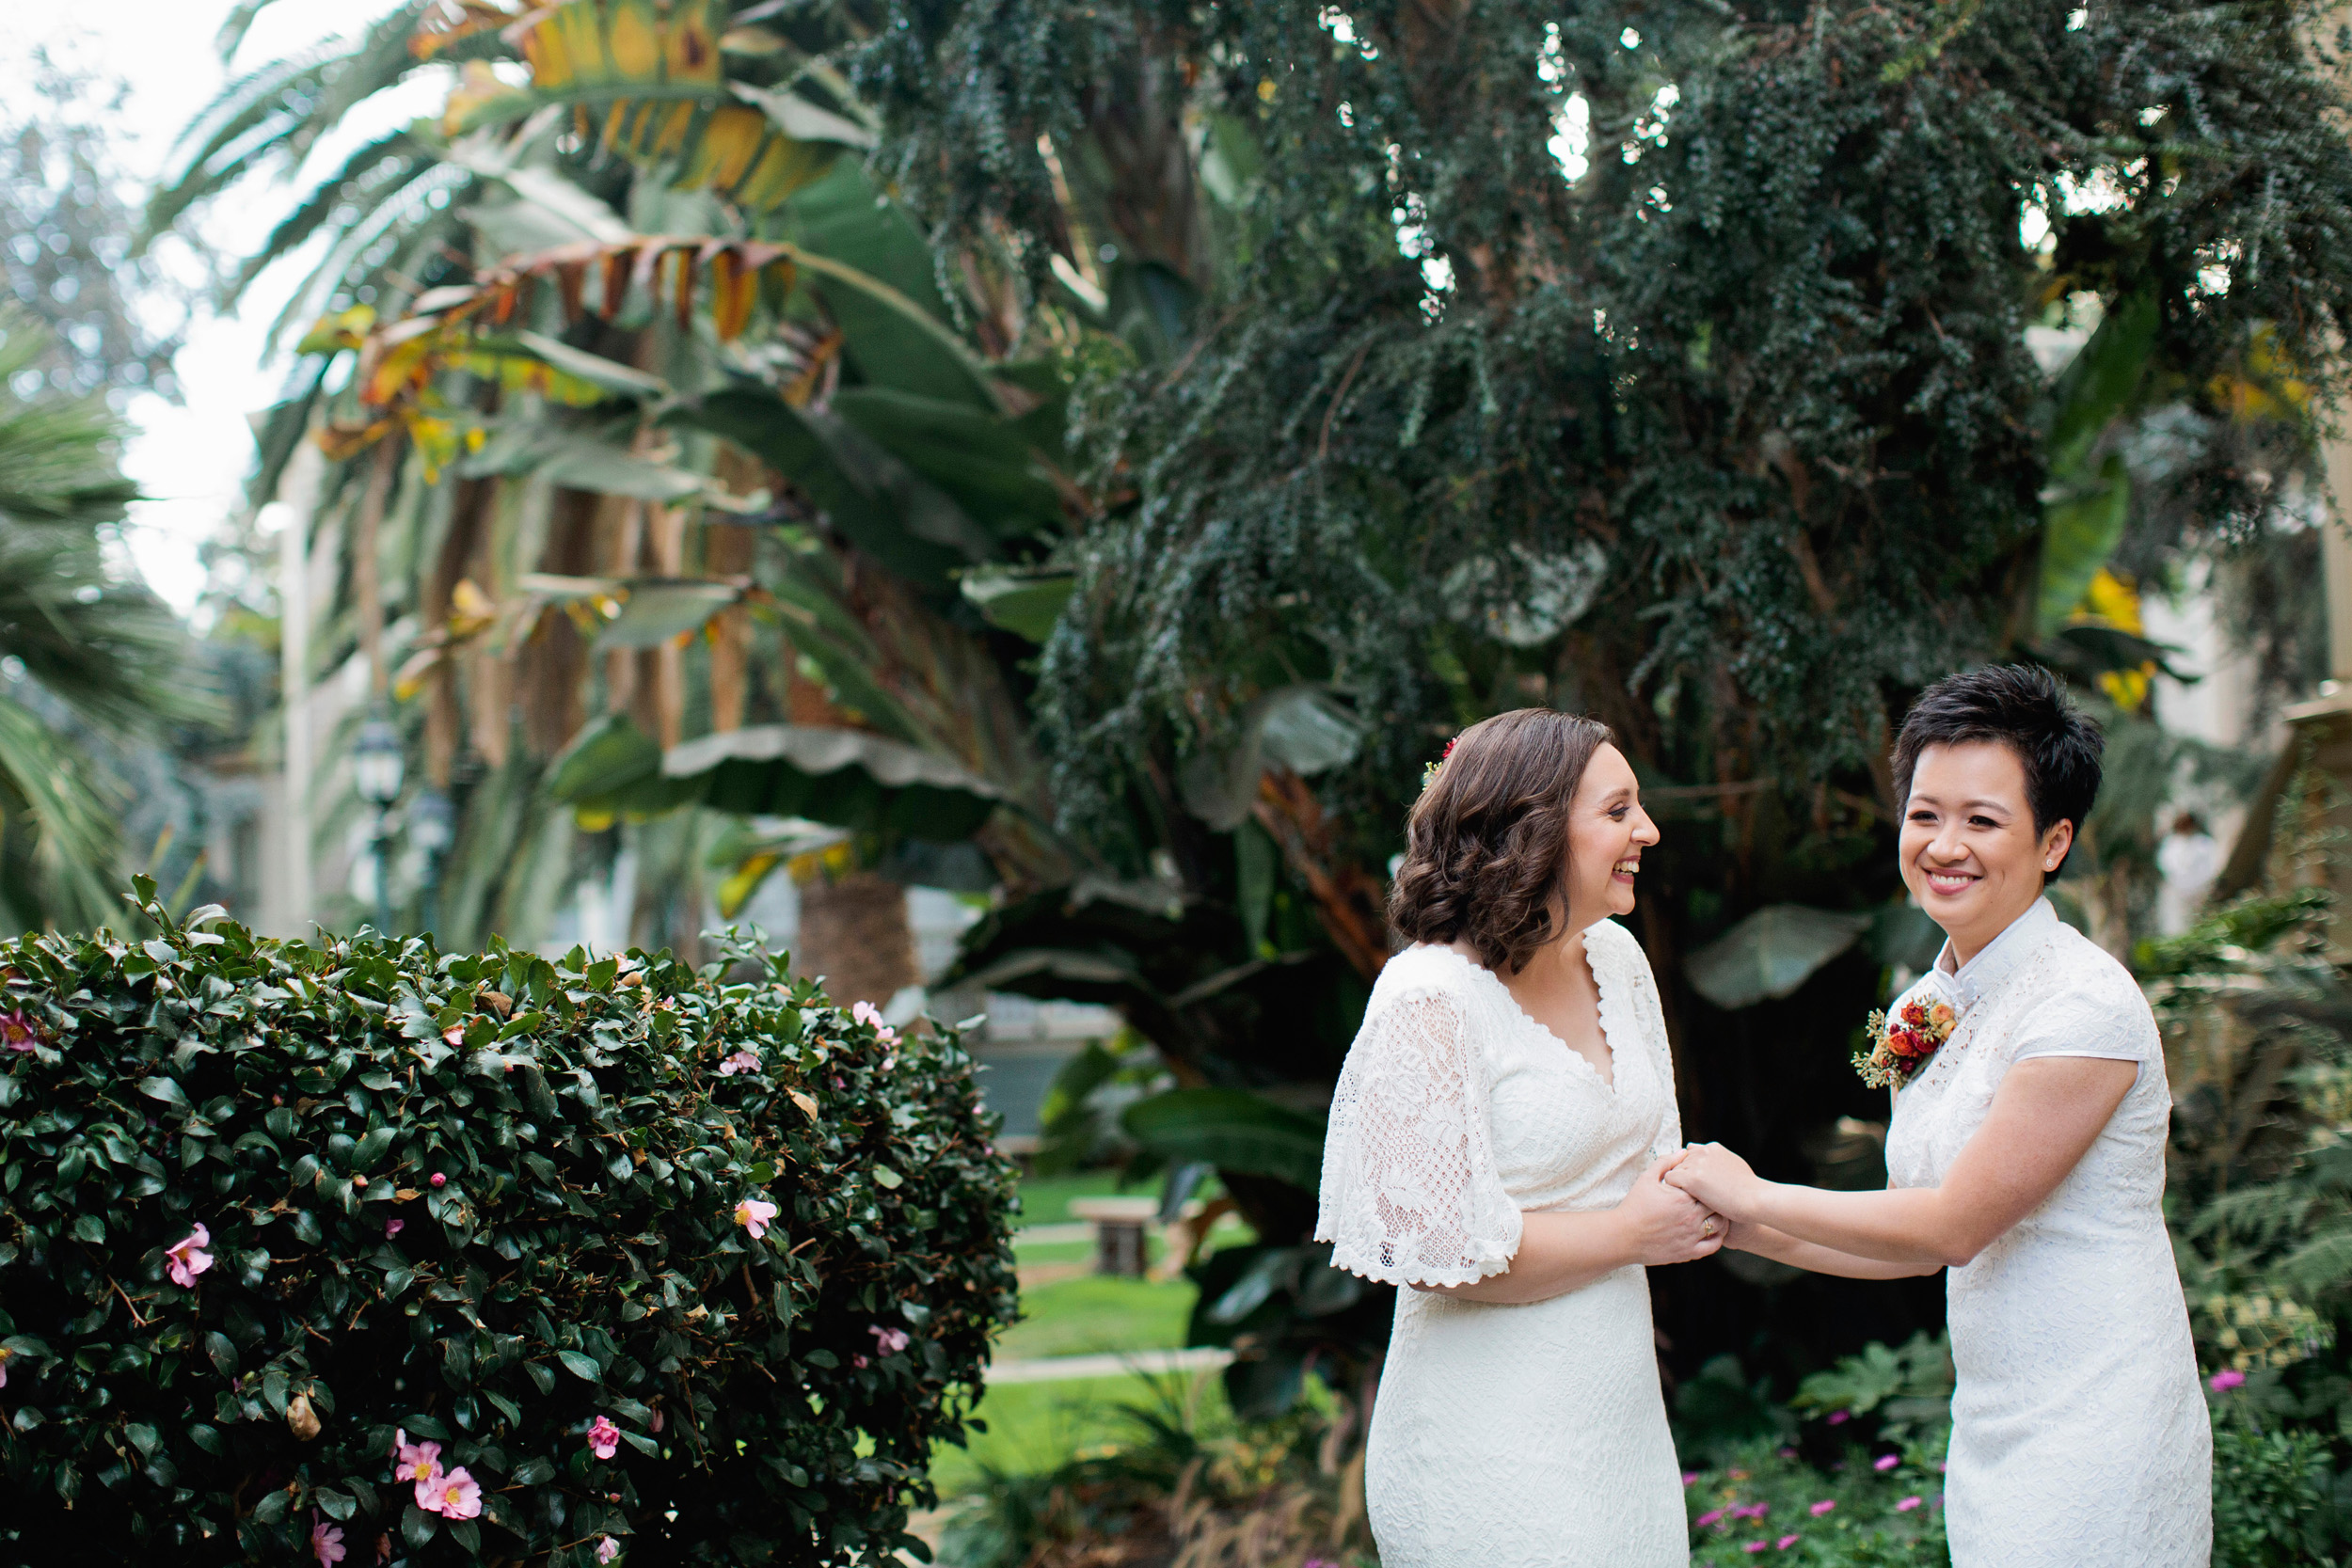 Oakland-Preservation-Park-Wedding-033.JPG